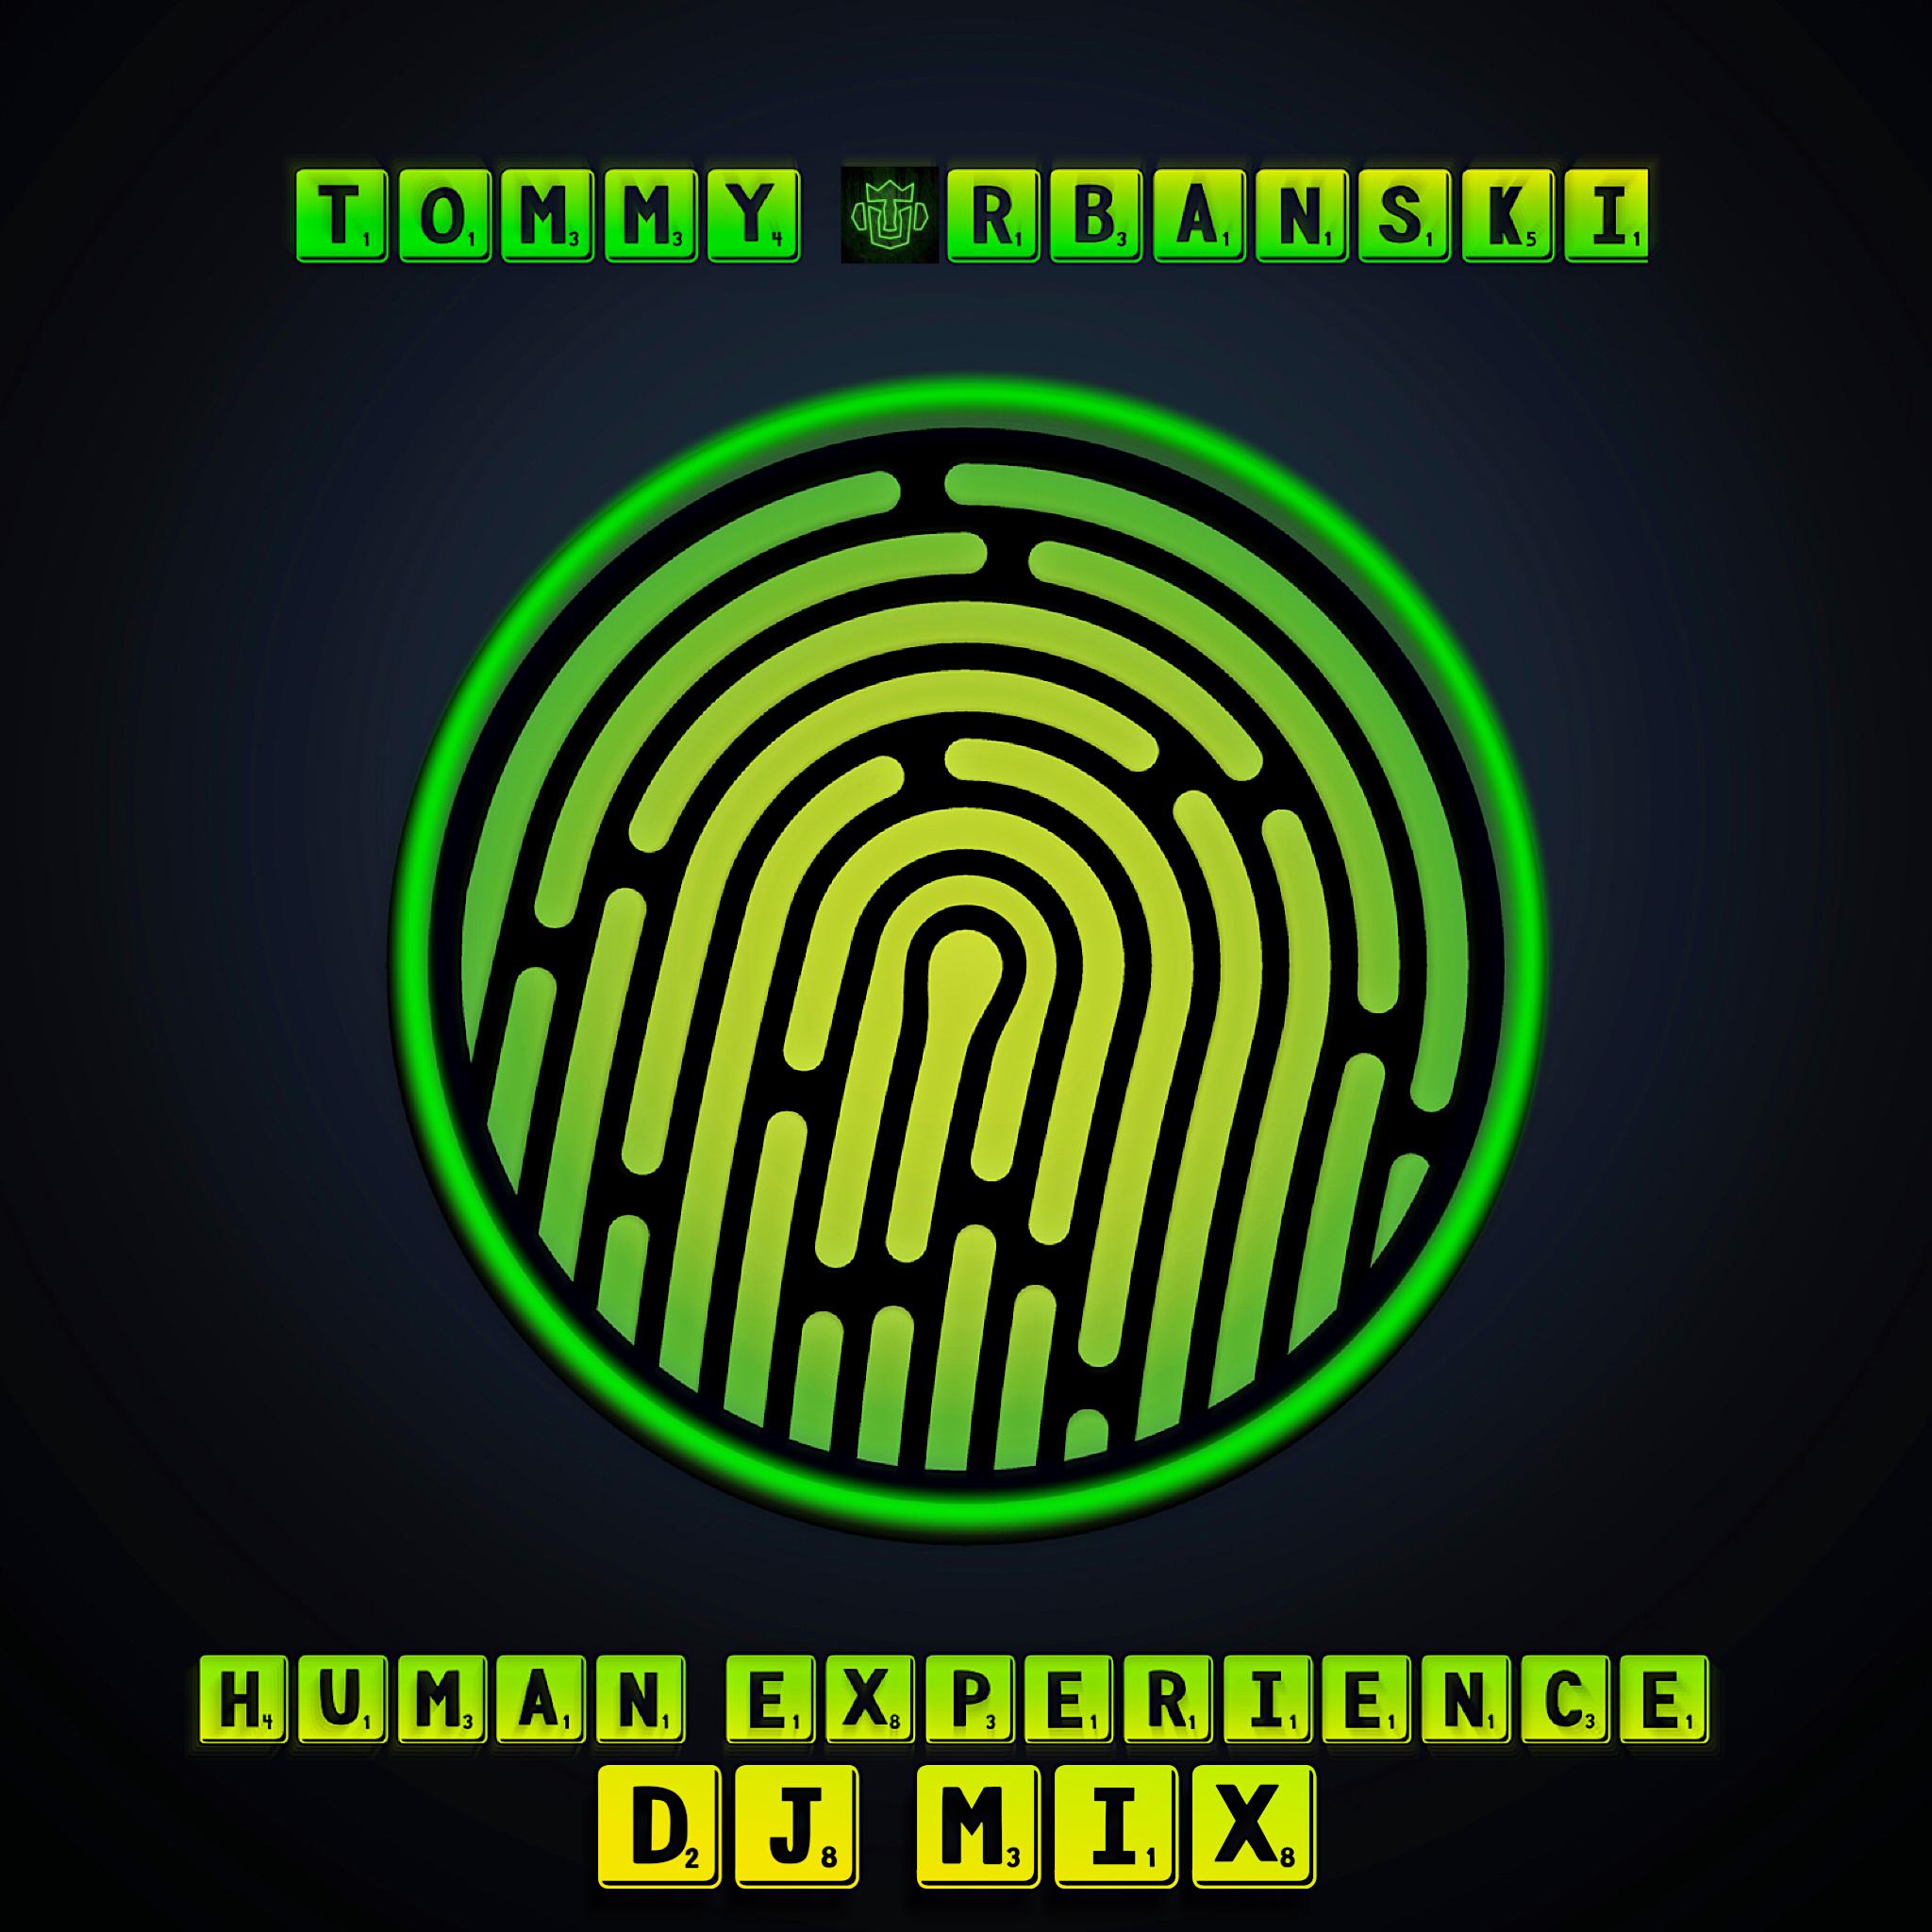 Human Experience - DJ Mix